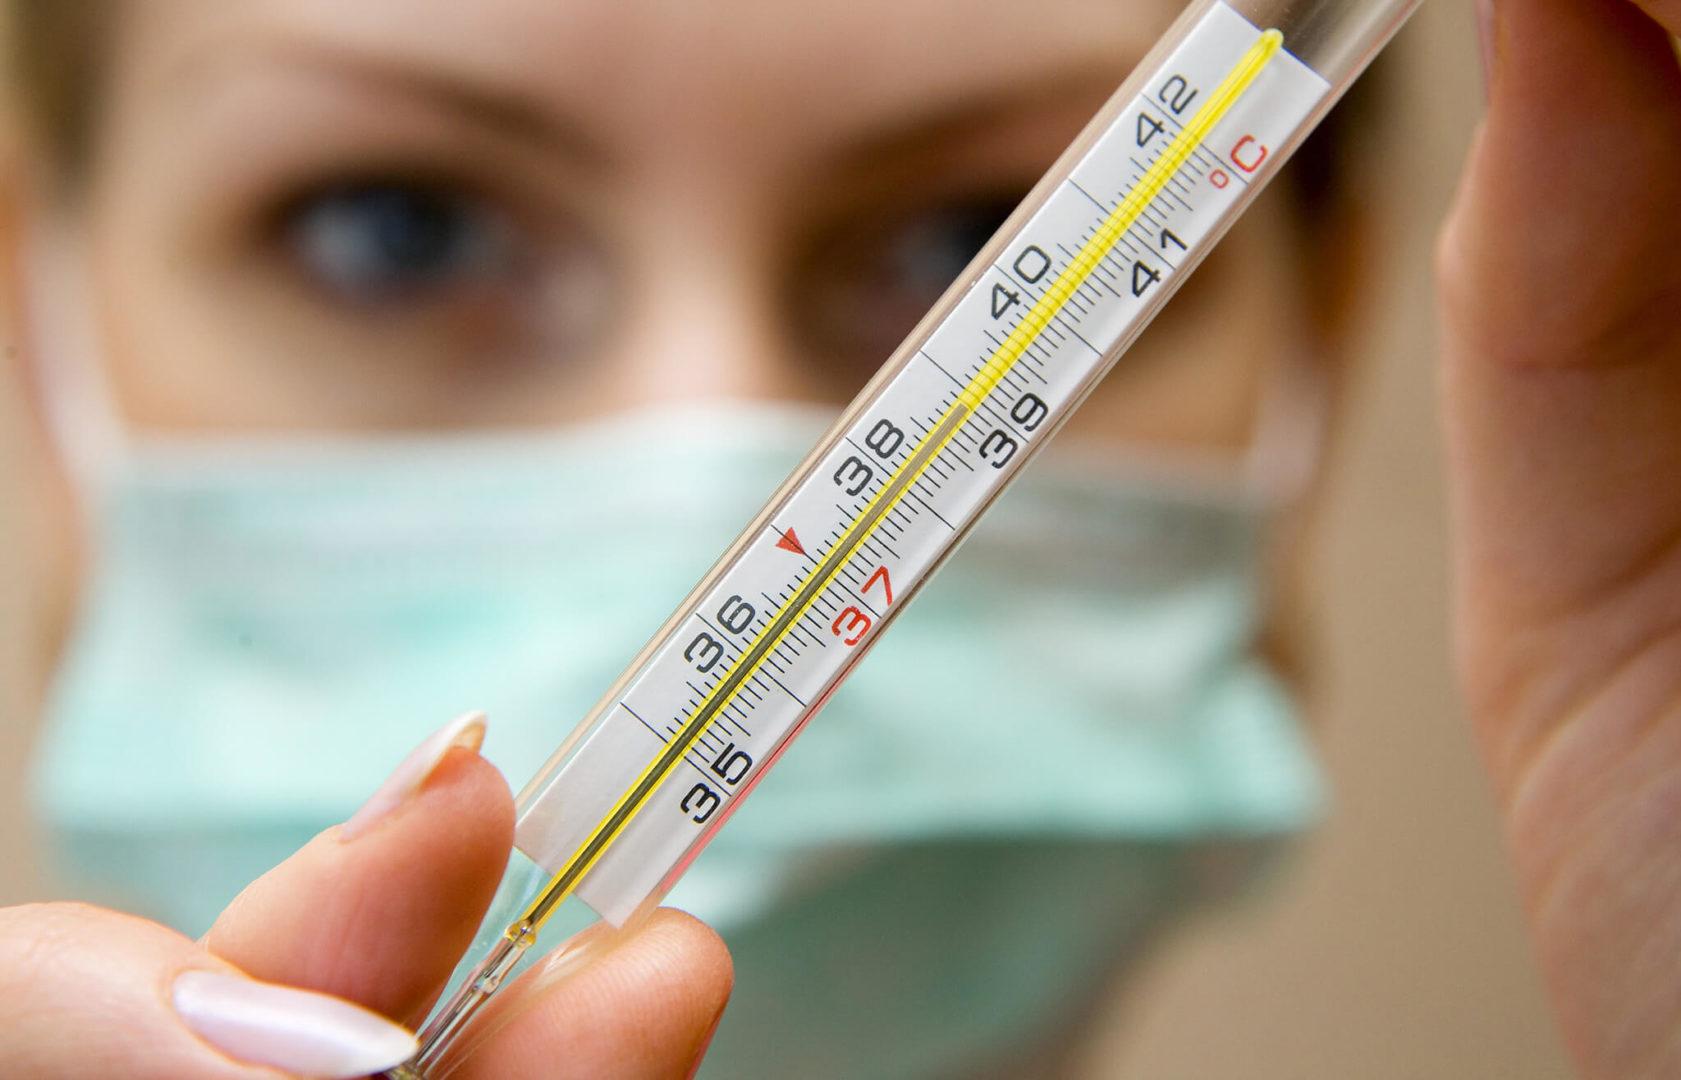 Два новых вируса гриппа прогнозируют санврачи Казахстана, вирус, Грипп, прогноз, Санврач